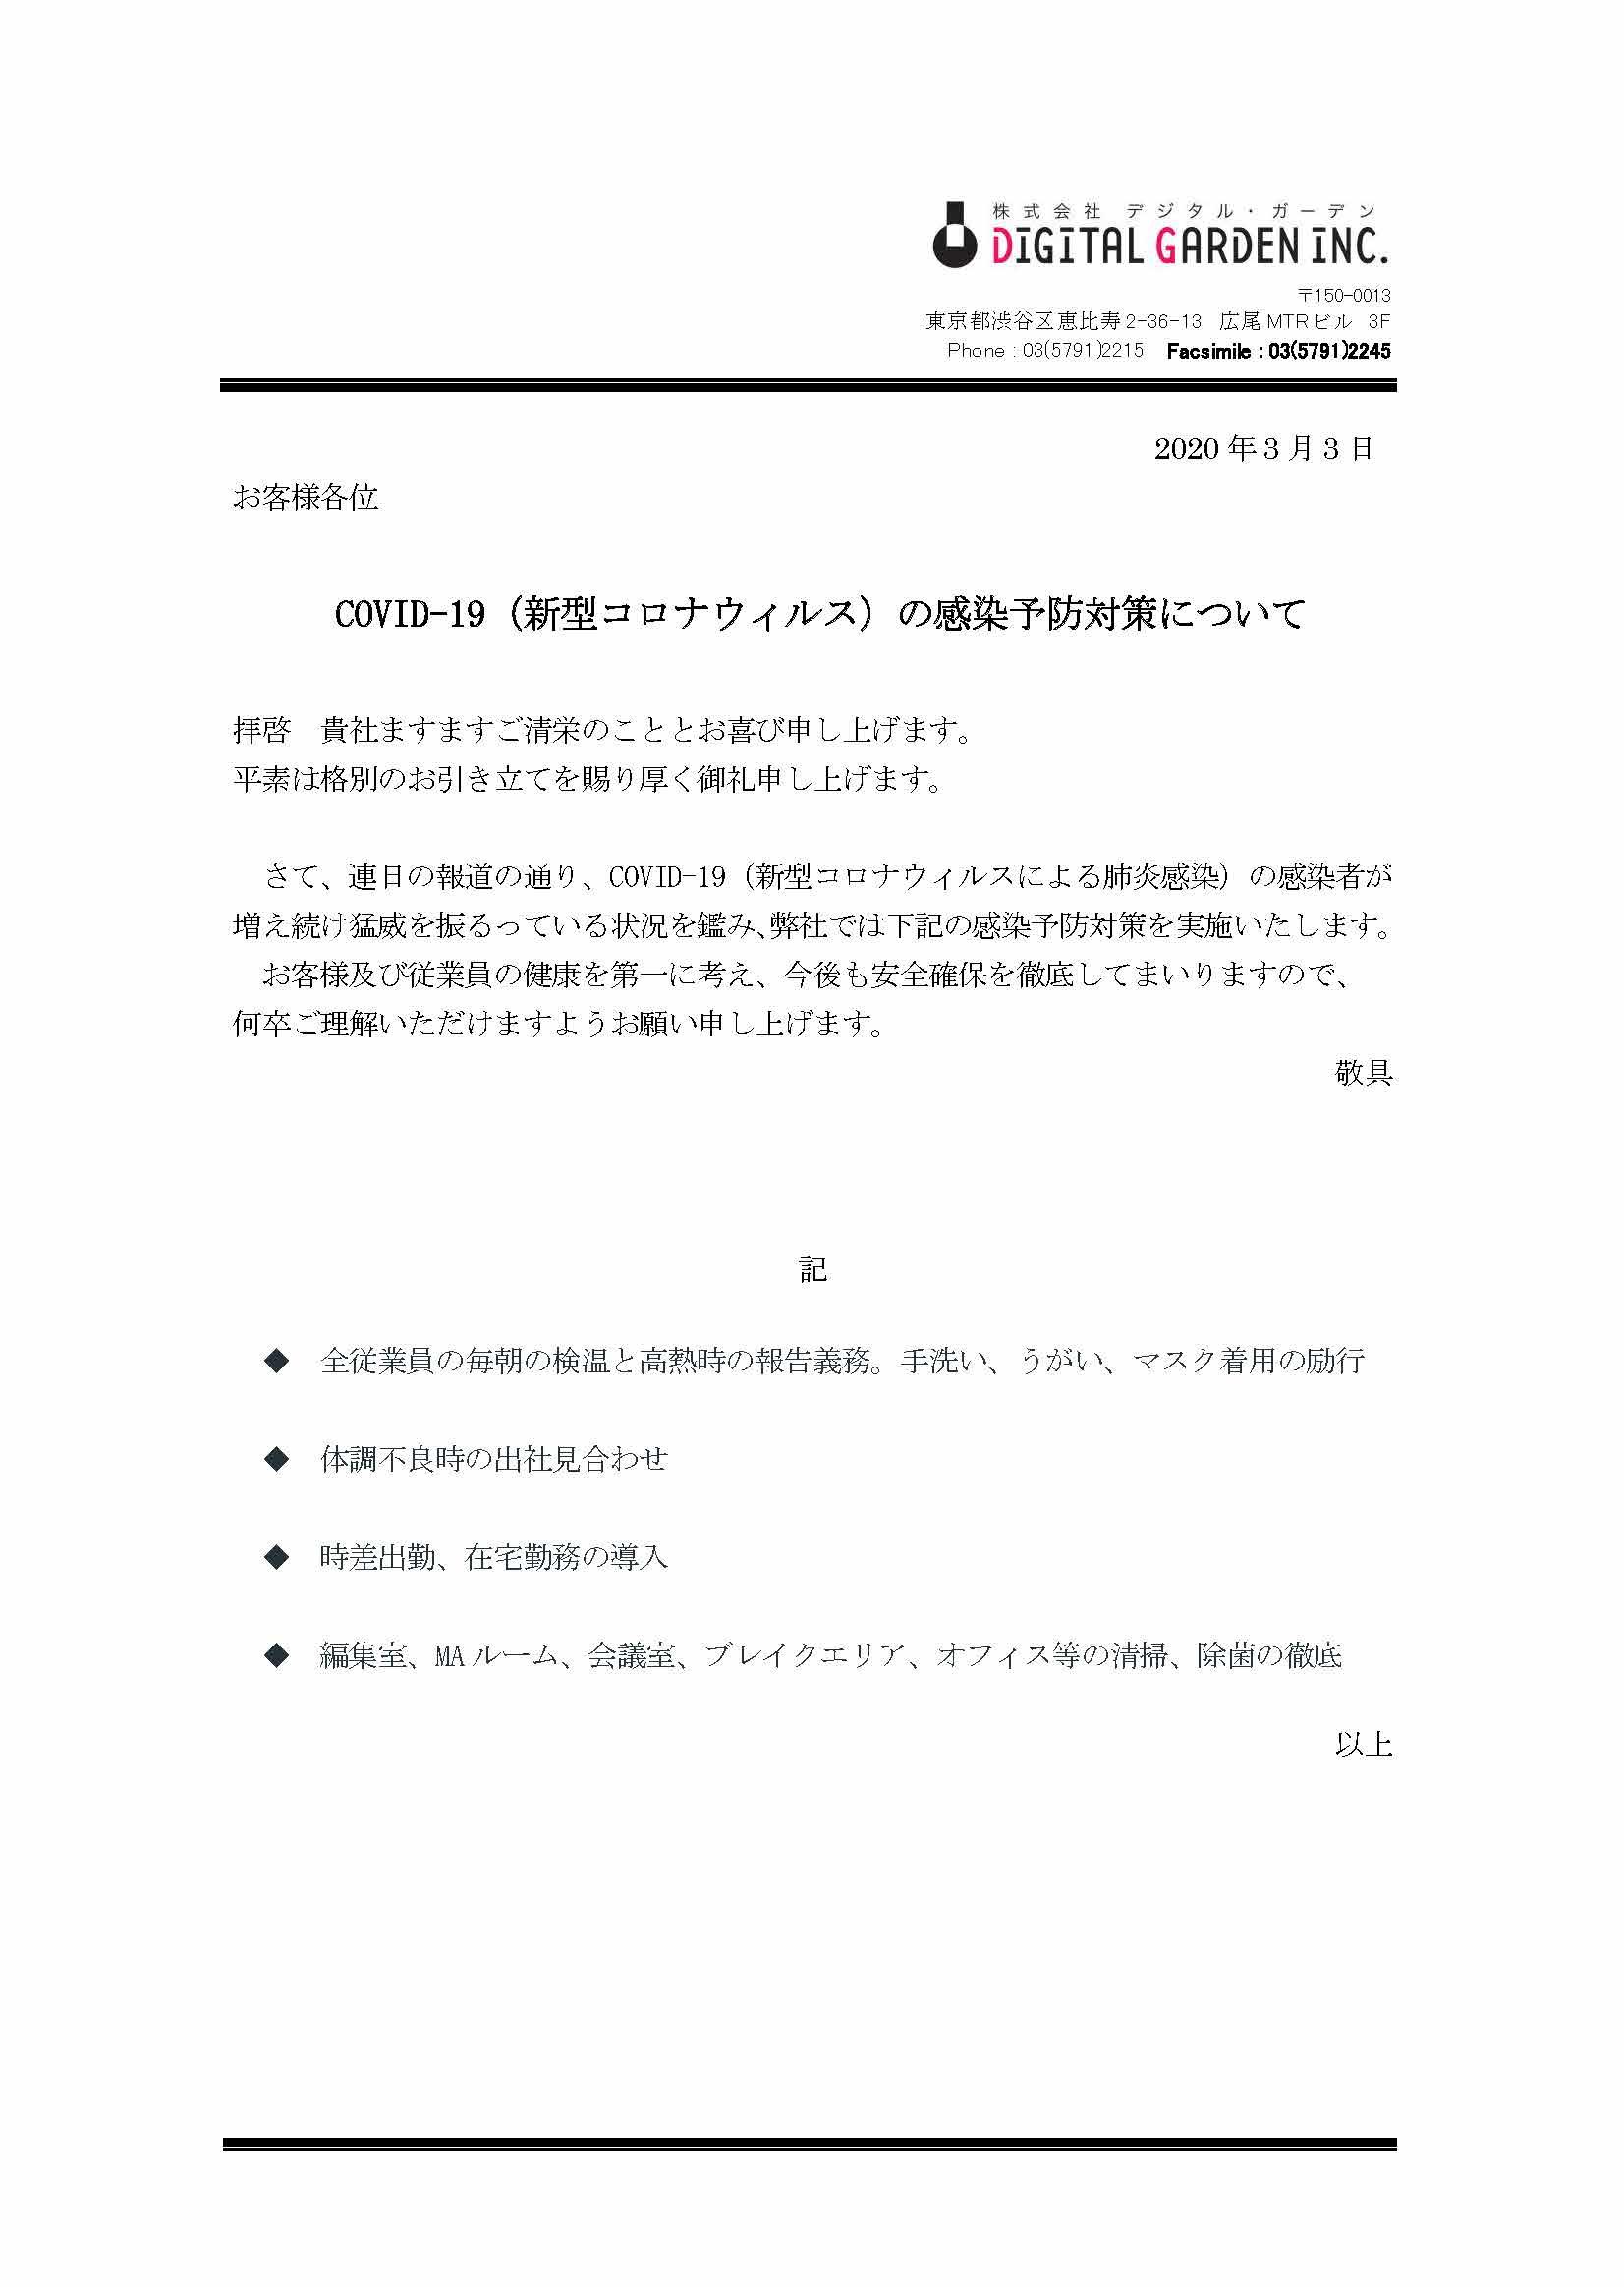 DGI_20200303コロナ対策のお知らせ